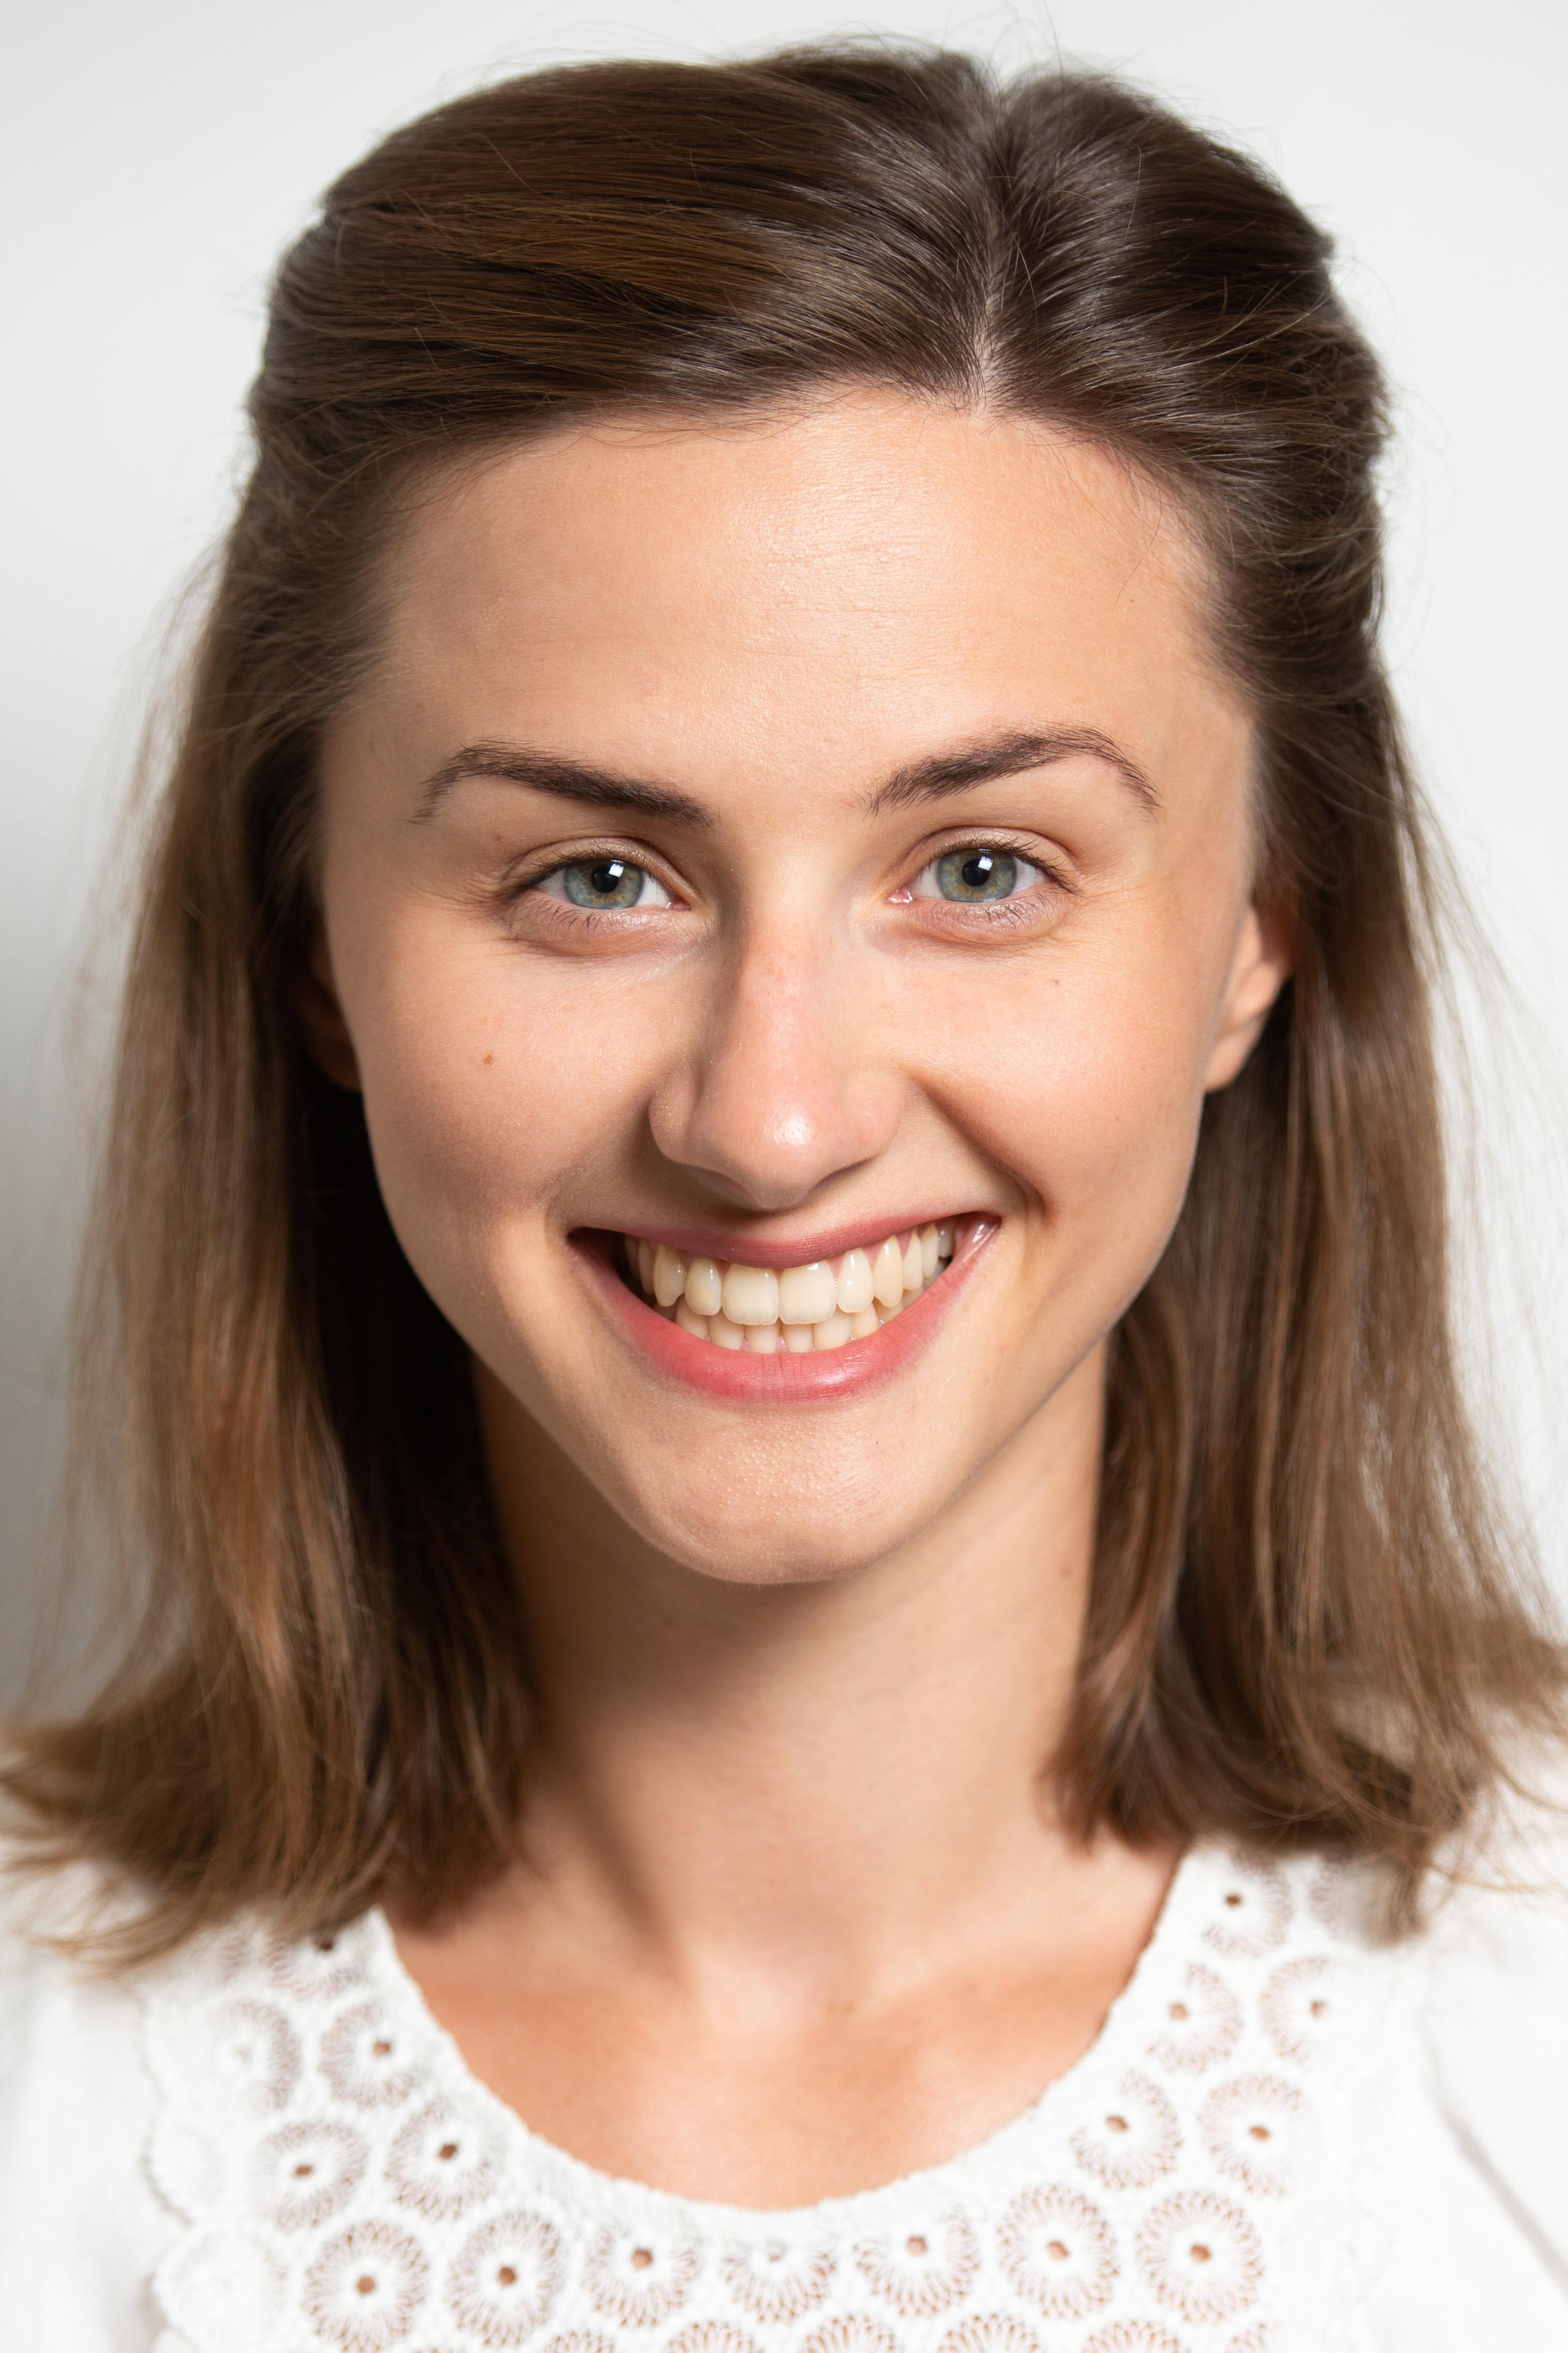 2020 Grantee Katelyn Mulcahy